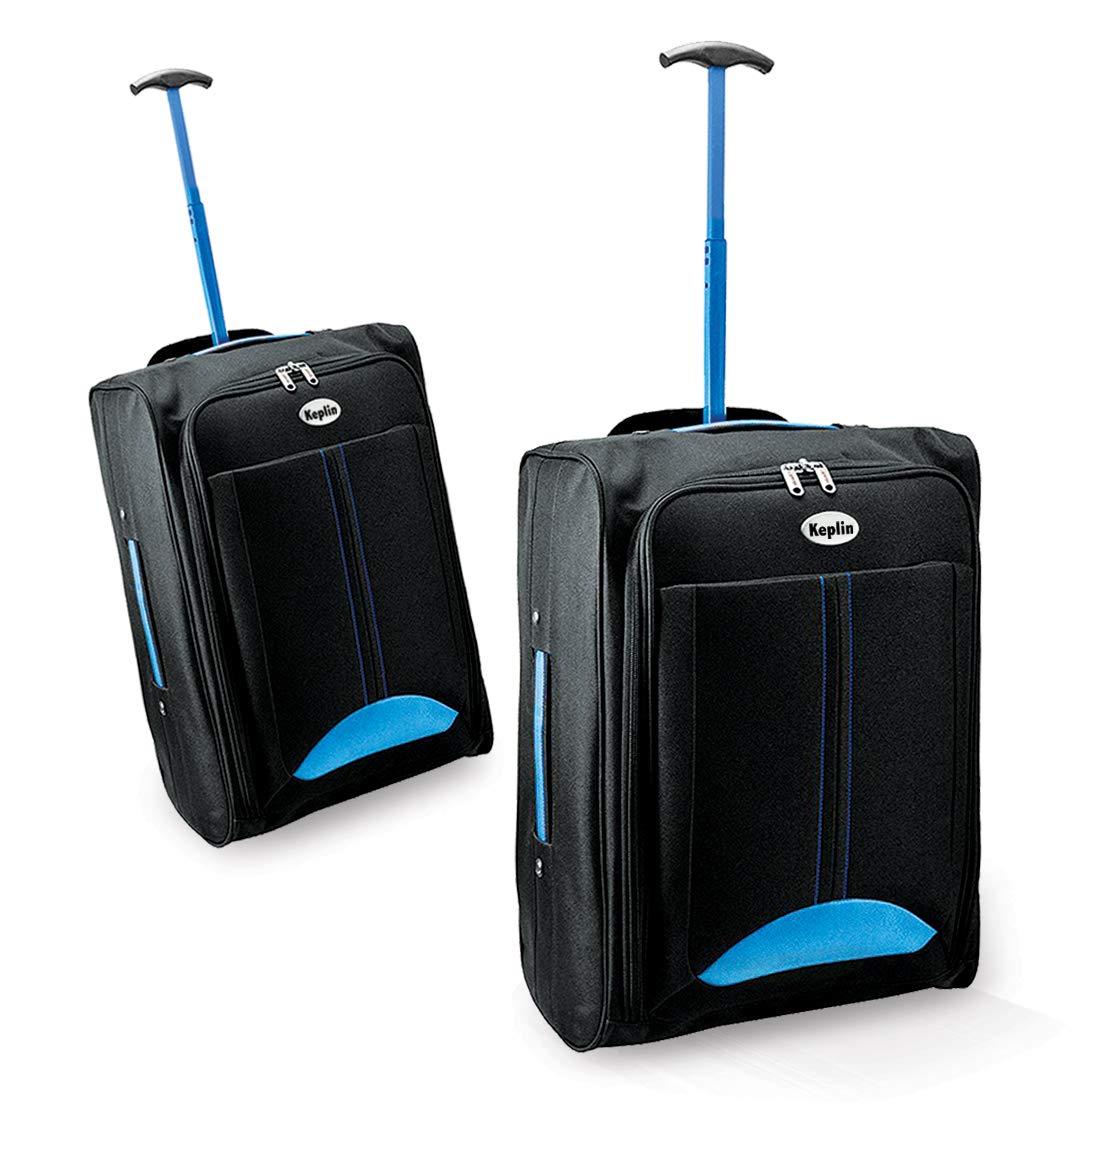 Amazon.com: KEPLIN - Maleta ligera para equipaje de mano con ...